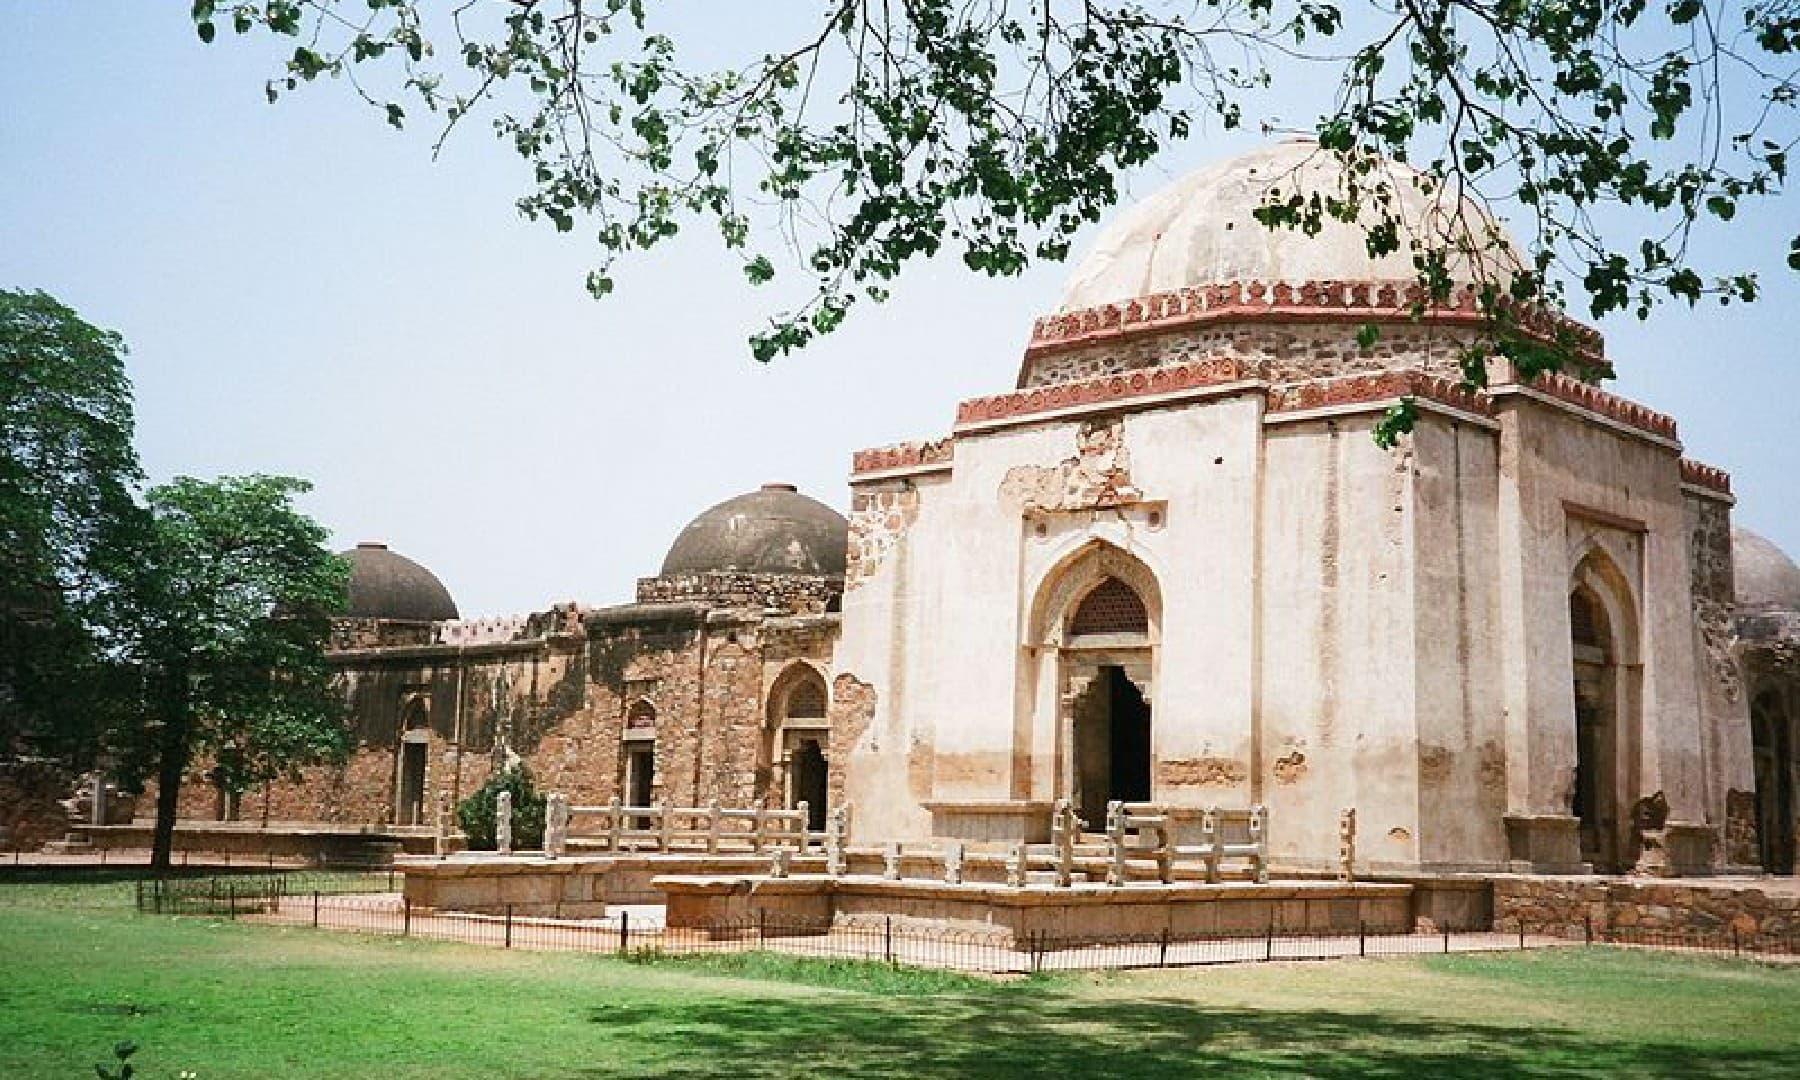 فیروز شاہ تغلق کا مقبرہ